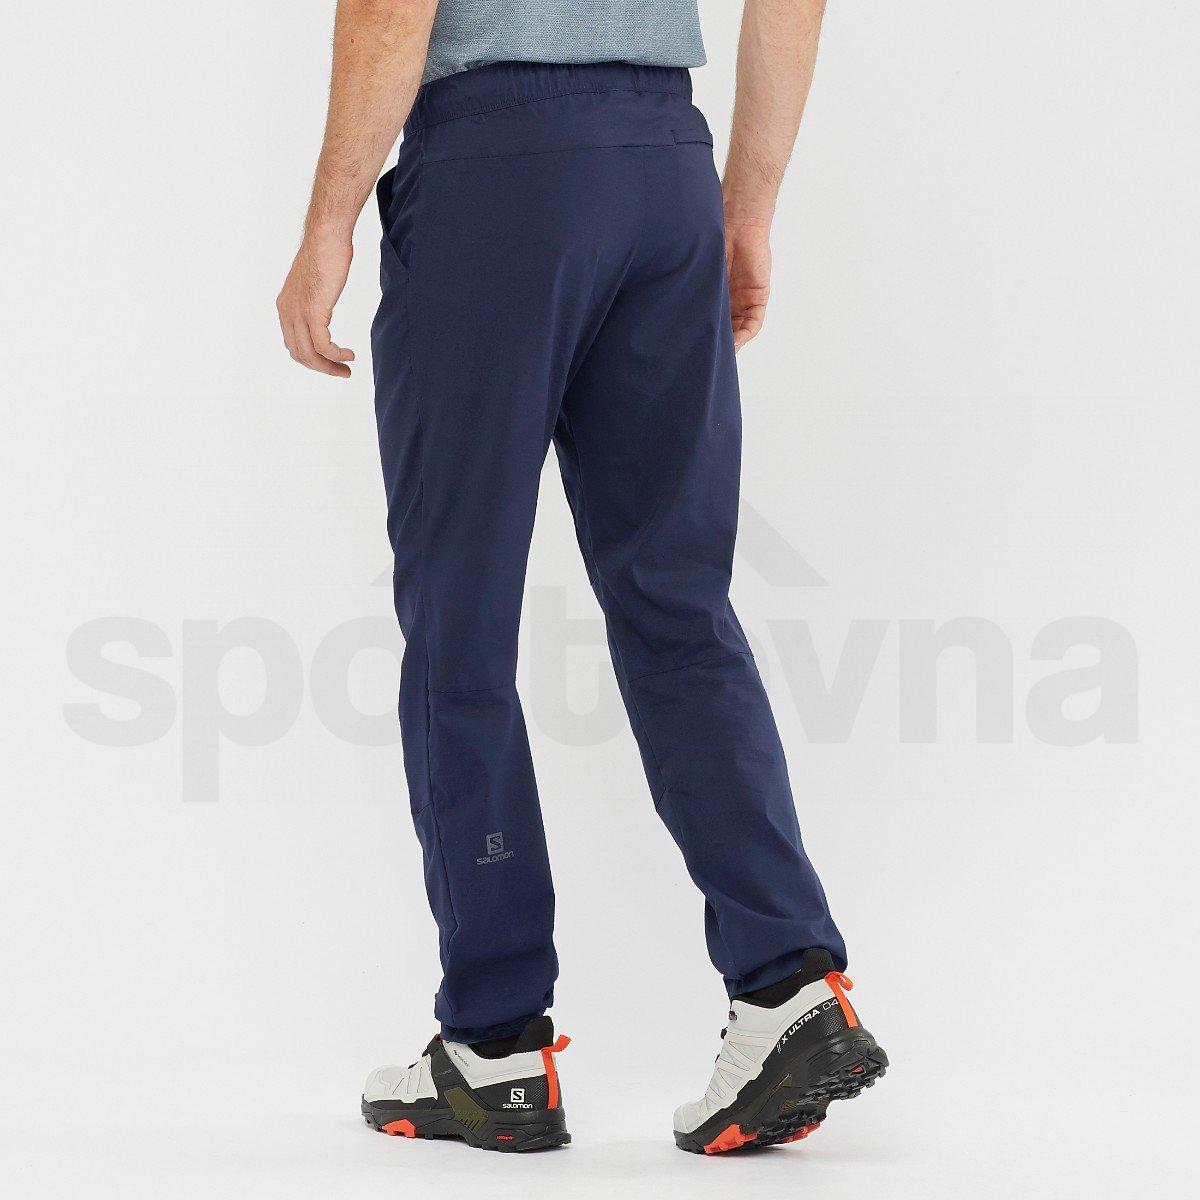 Kalhoty Salomon EXPLORE TAPERED PANTS M - modrá